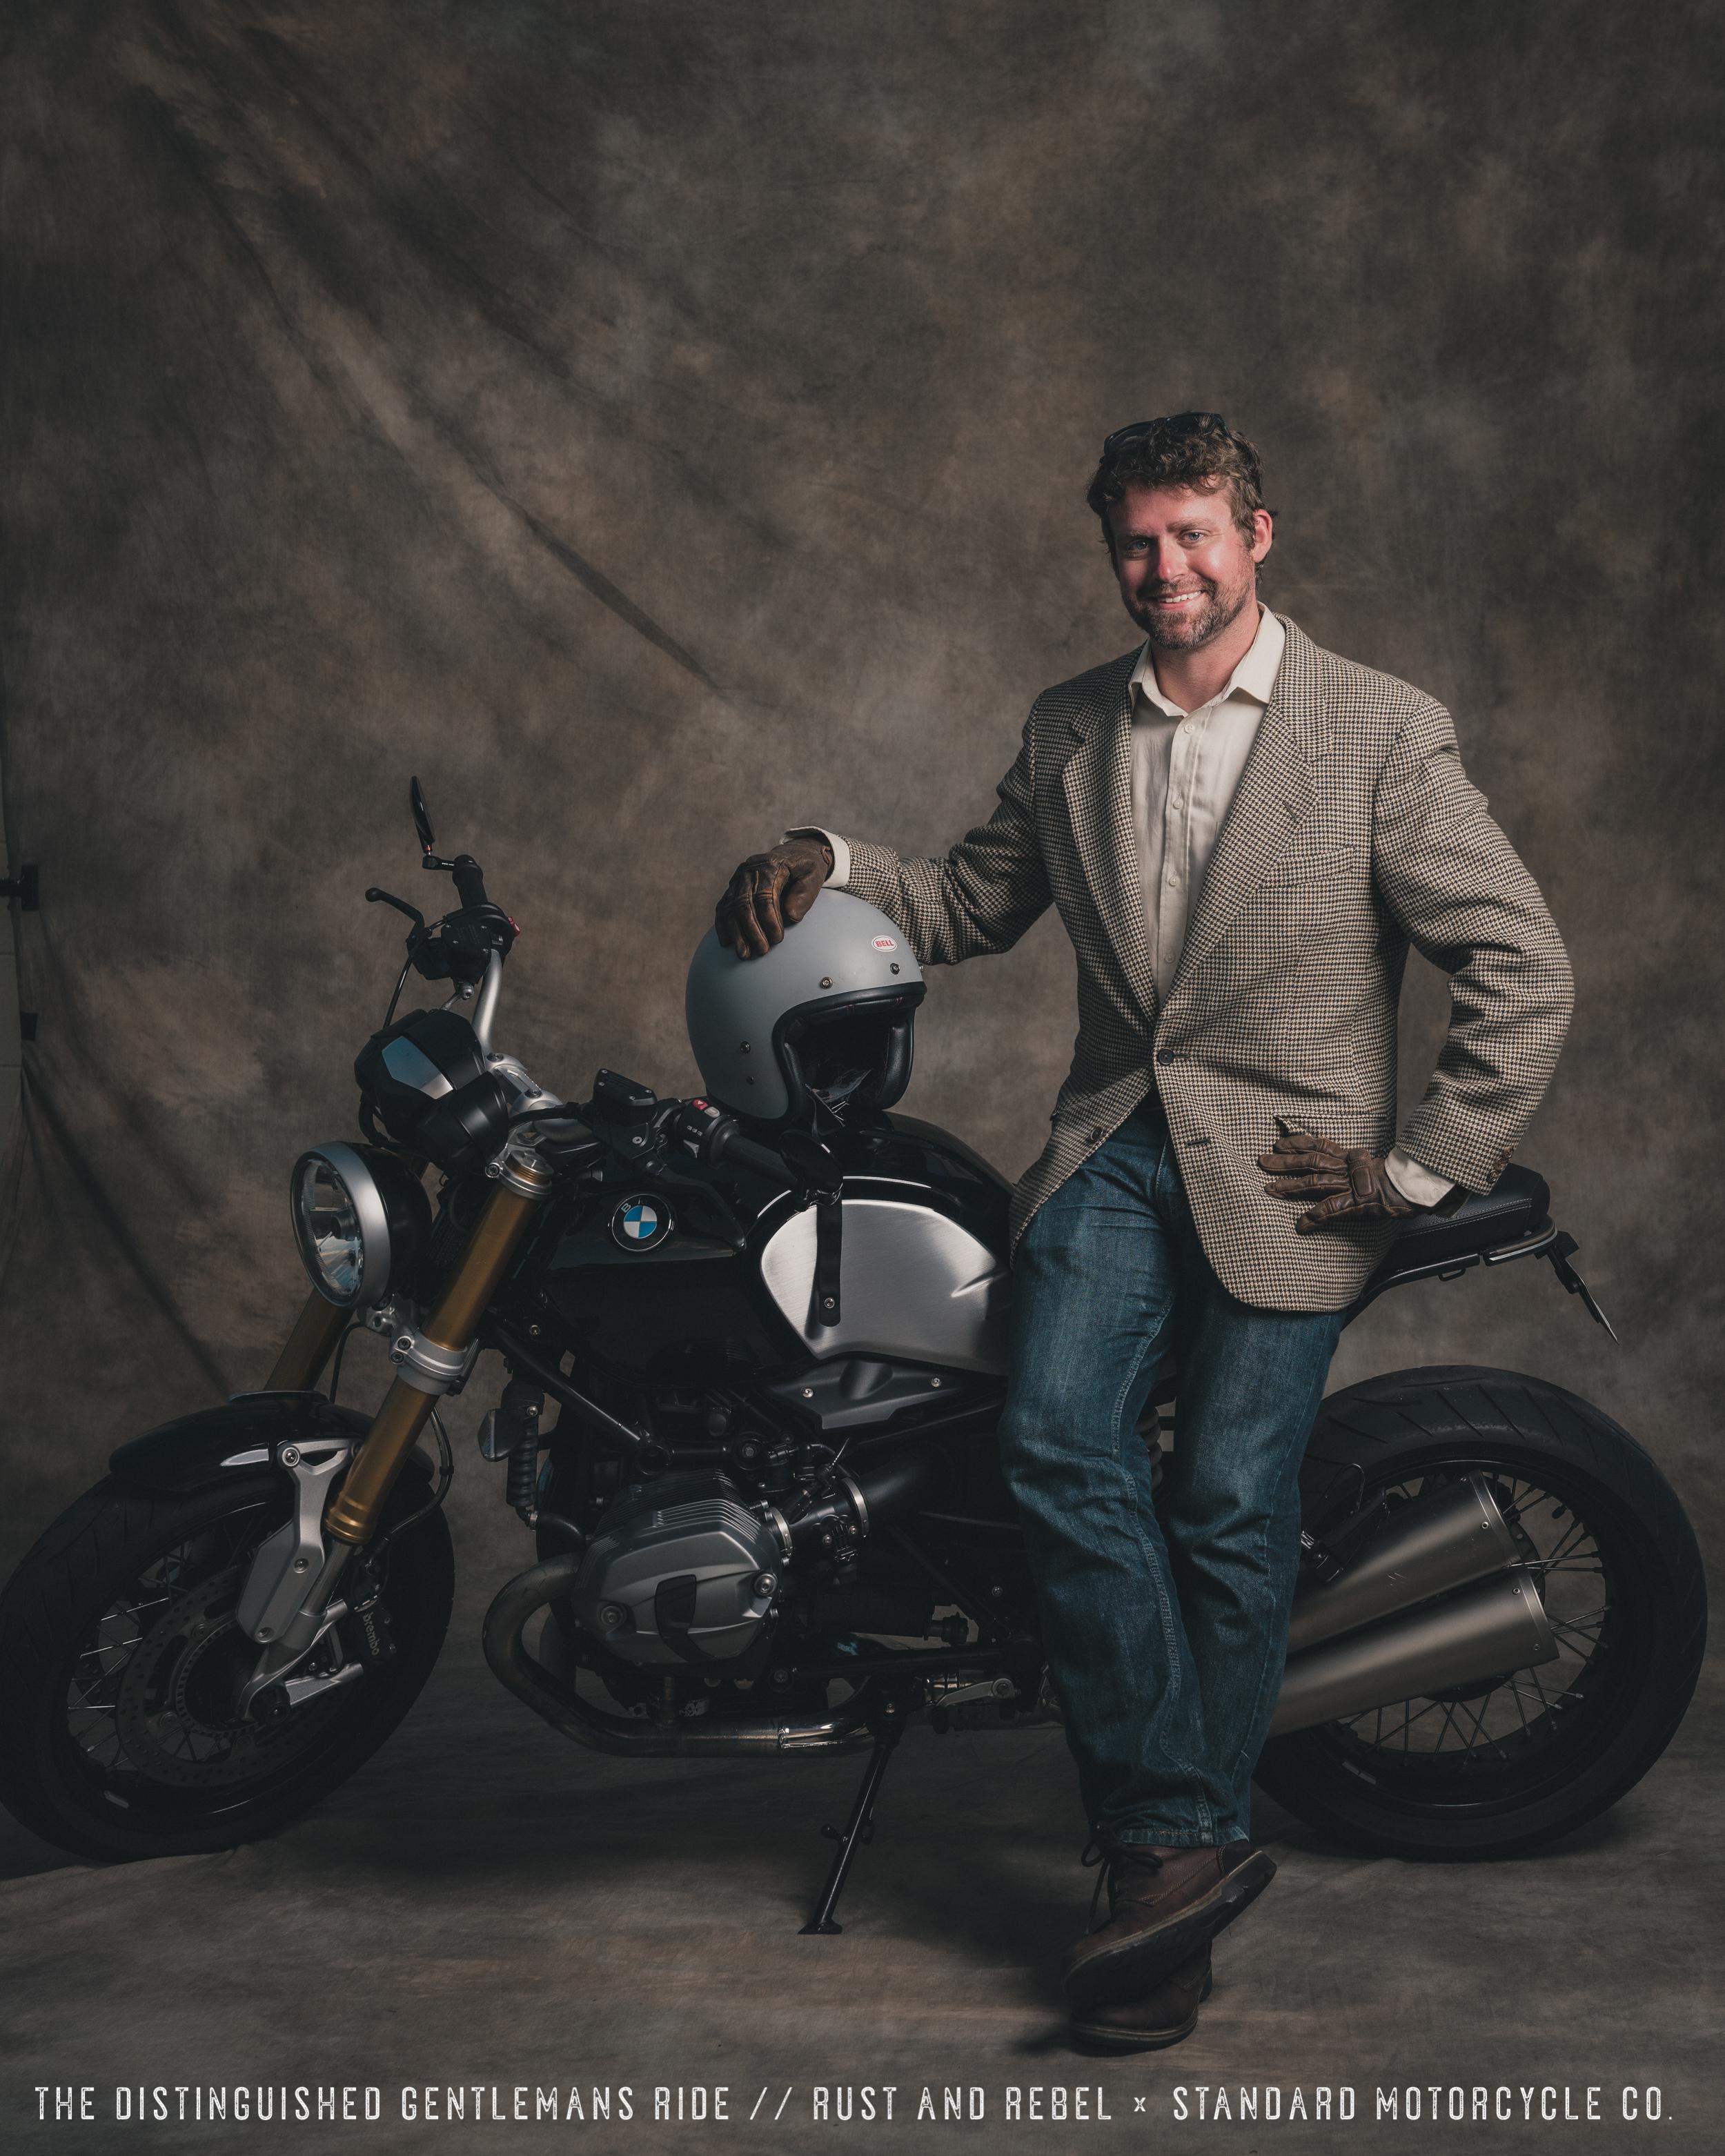 The Distinguished Gentleman's Ride 2019 [PEOPLE - PHOTO BY @MIKEDUNNUSA] - 0141.jpg